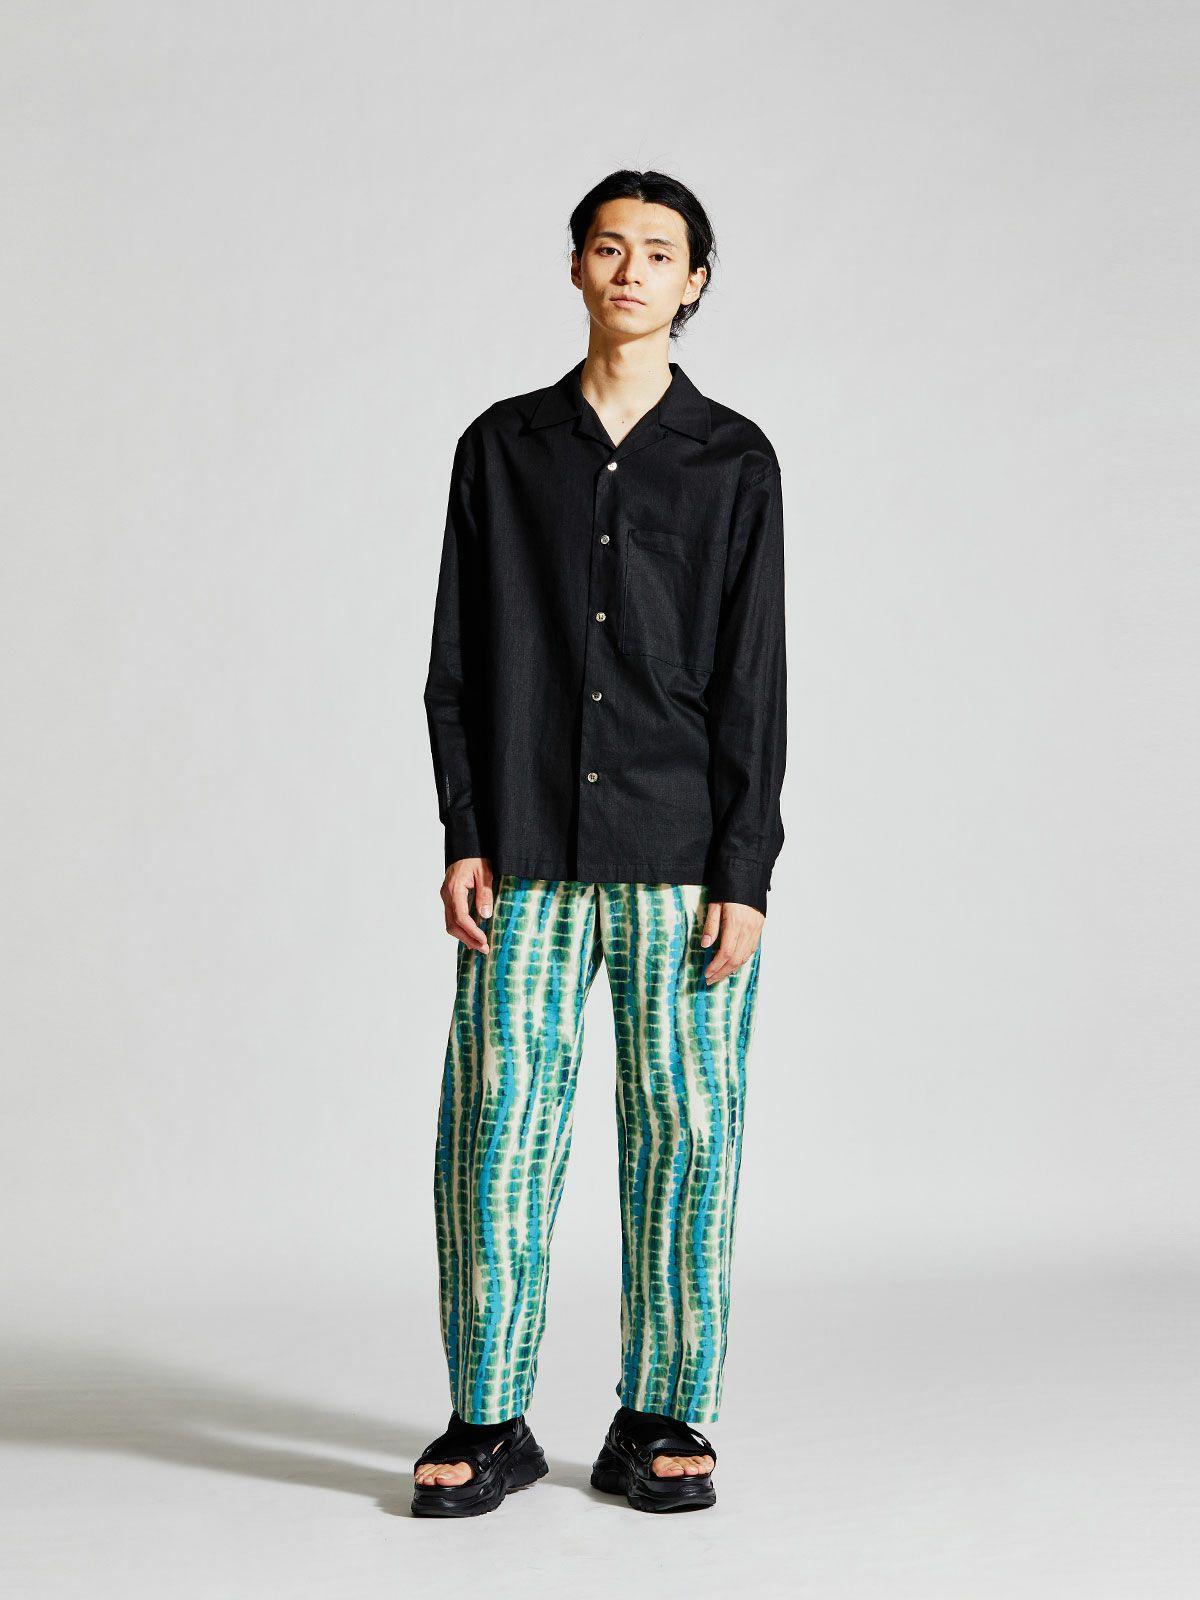 MIDIUMISOLID Men's オープンカラーシャツ